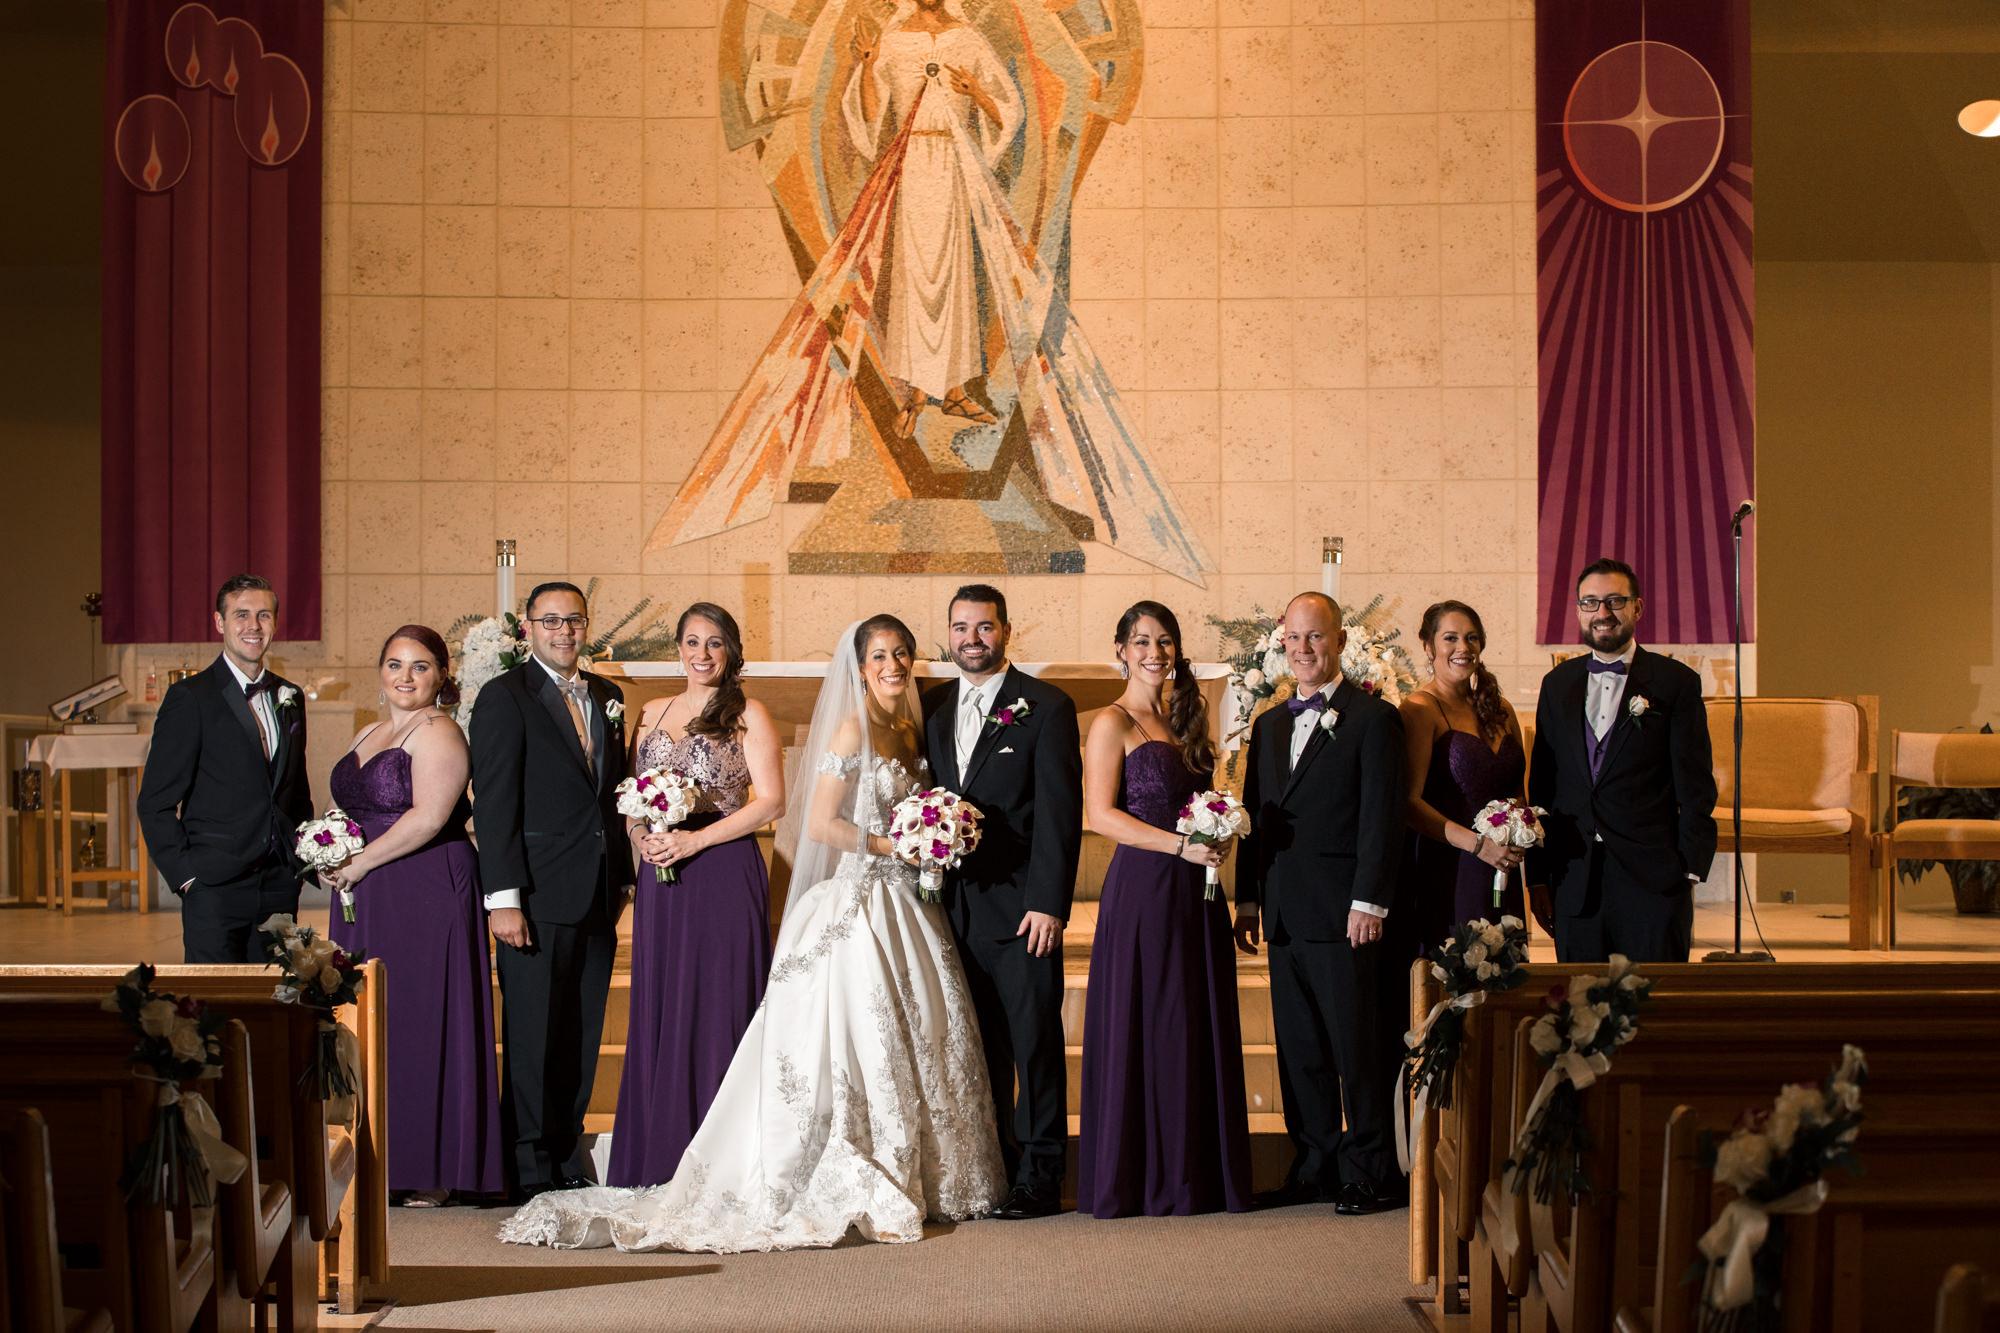 Benvenuto_Wedding_catholic_Florida_Bride-Groom-60.jpg